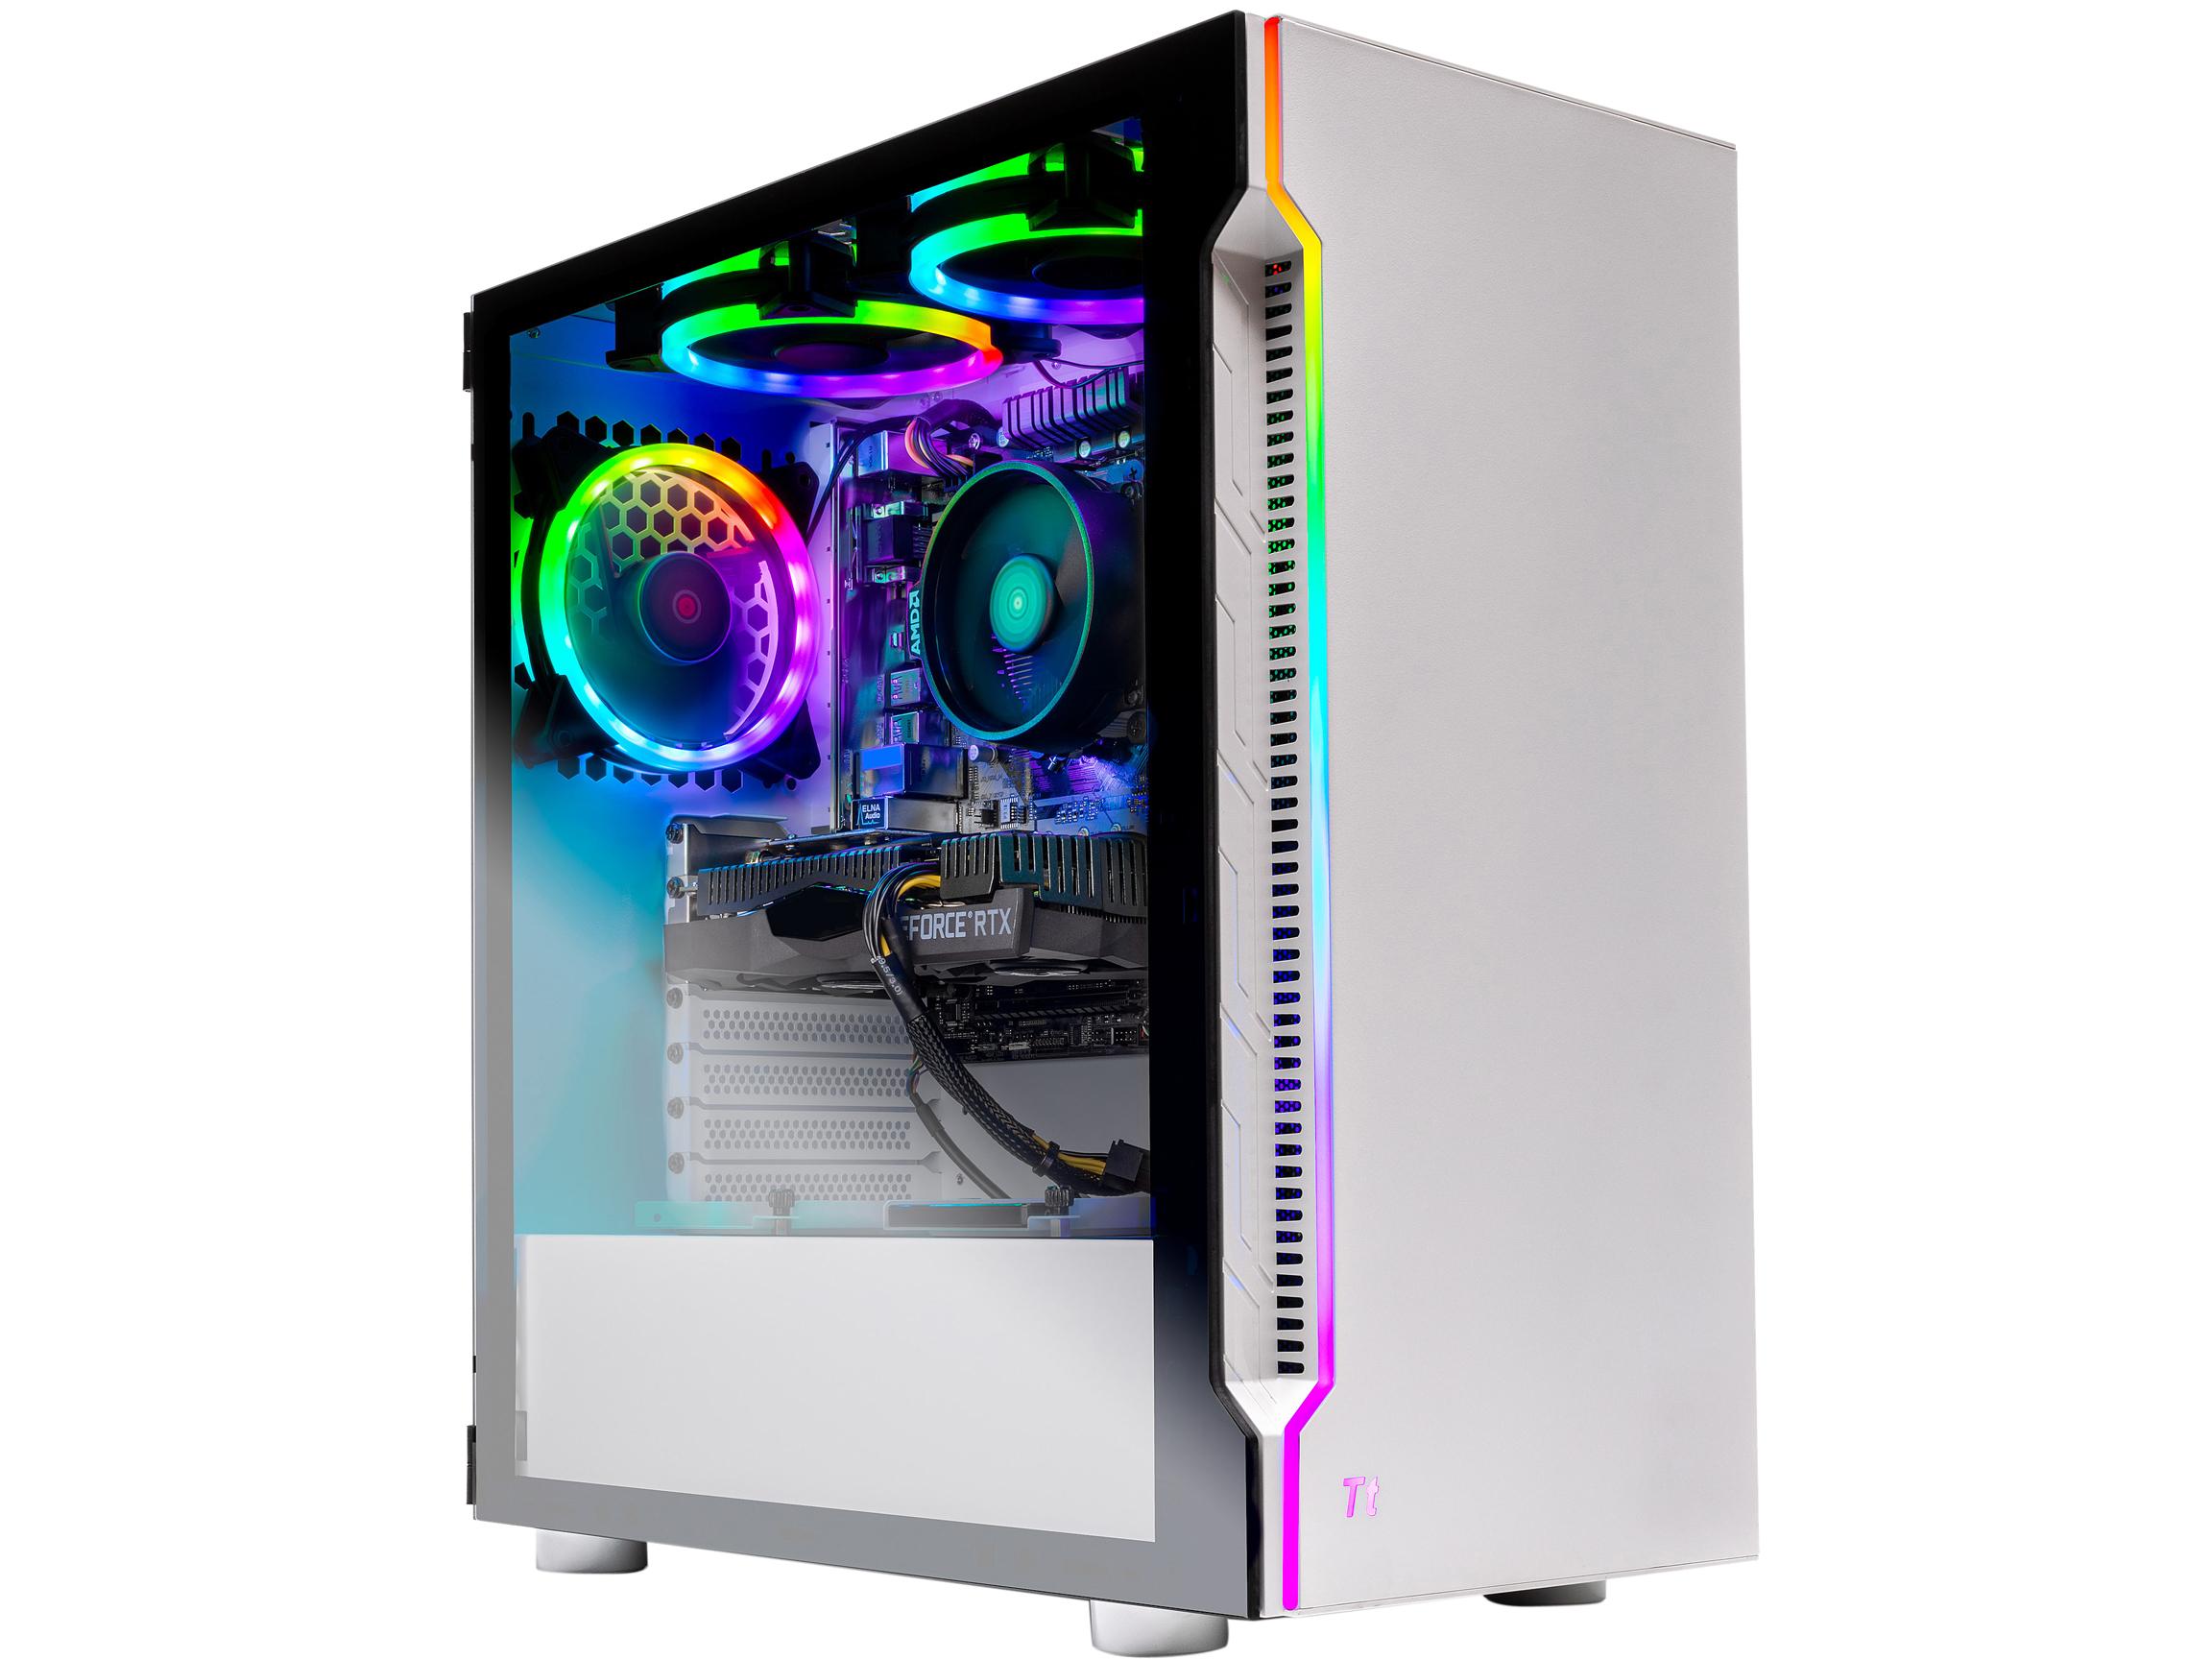 SkyTech Archangel AMD Ryzen 5 3600 NVIDIA GeForce RTX 2060 16GB DDR4 500GB SSD Win 10 Home Gaming Desktop, ST-Arch3.0-0056-NE